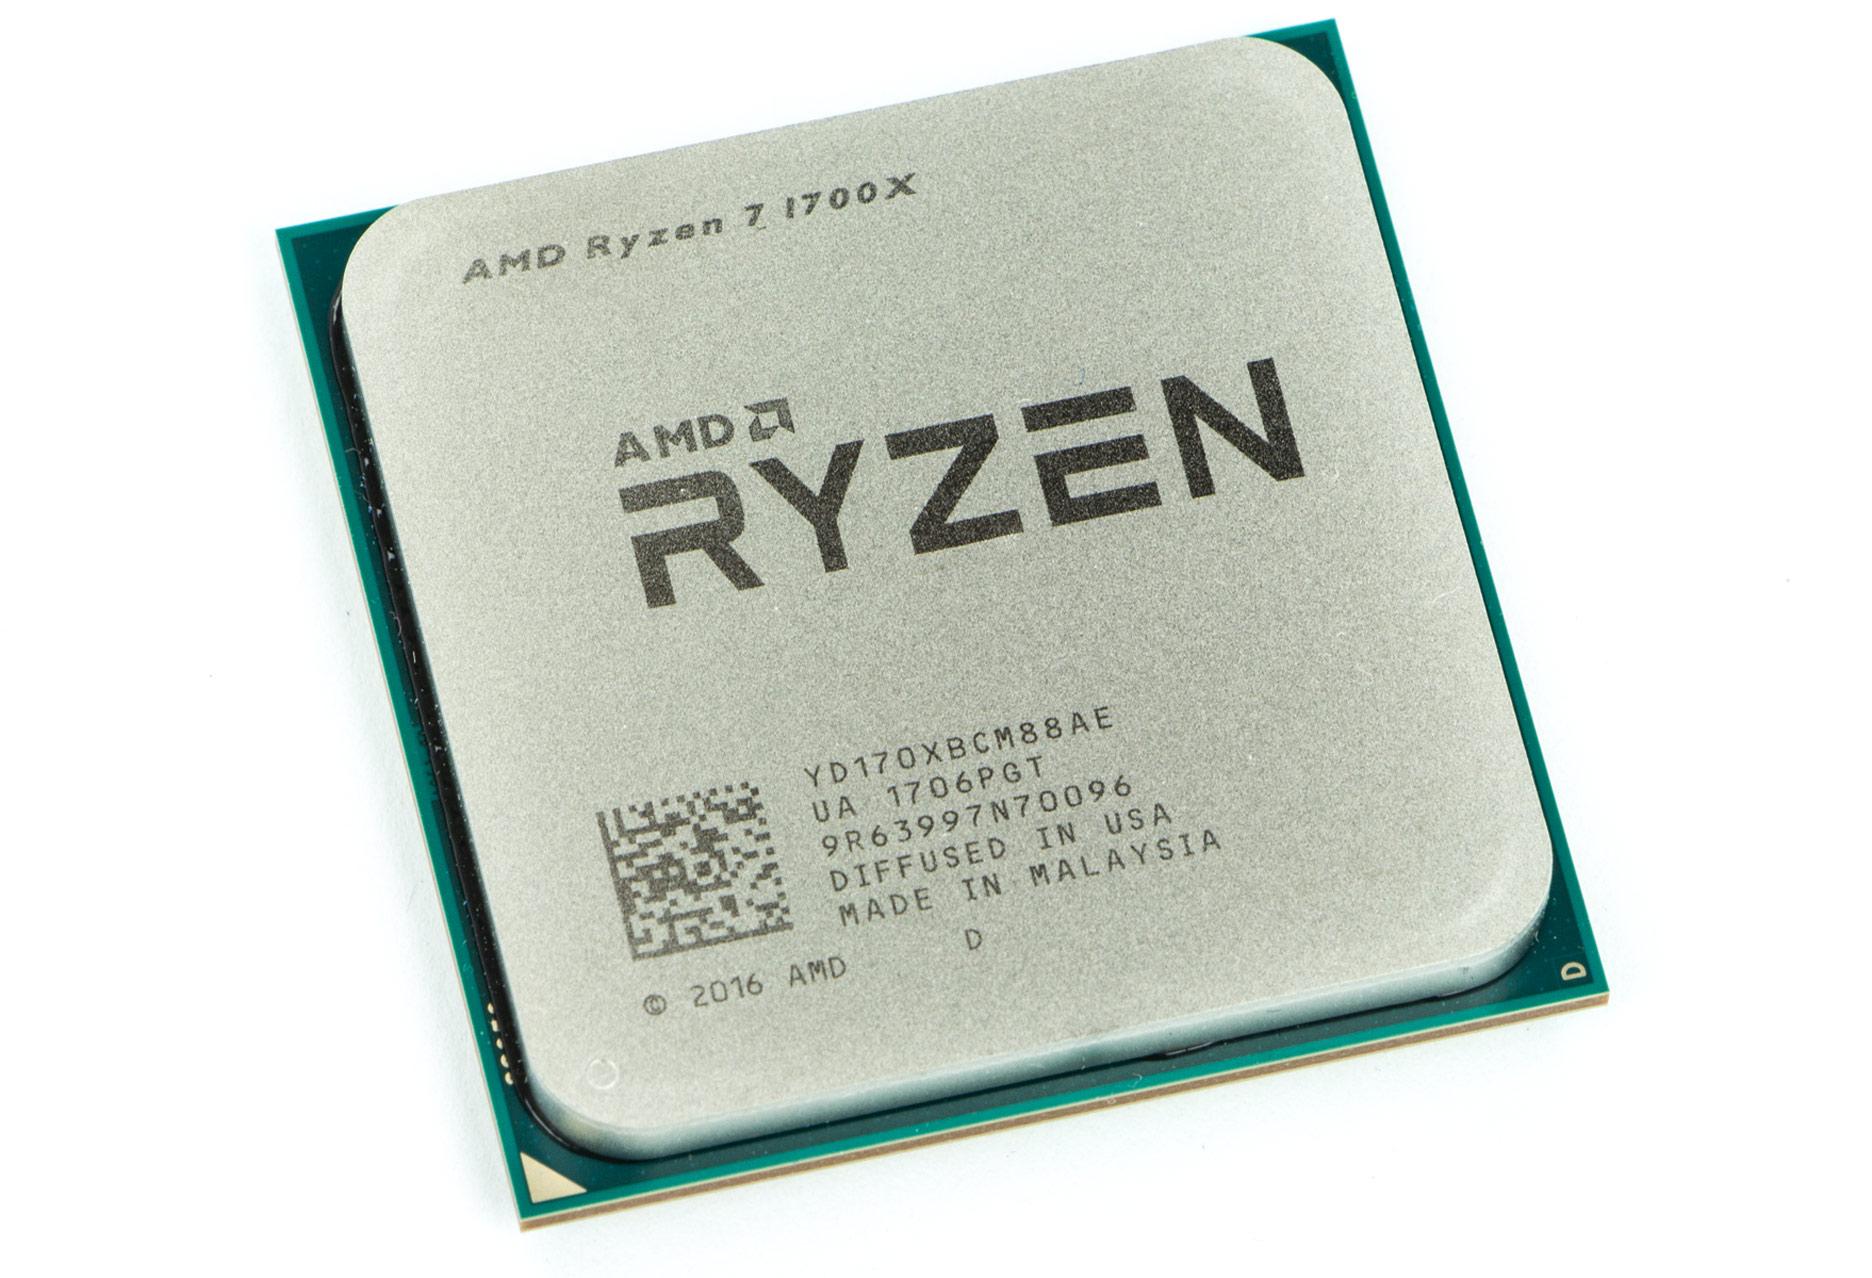 AMD Ryzen 7 1700X procesor